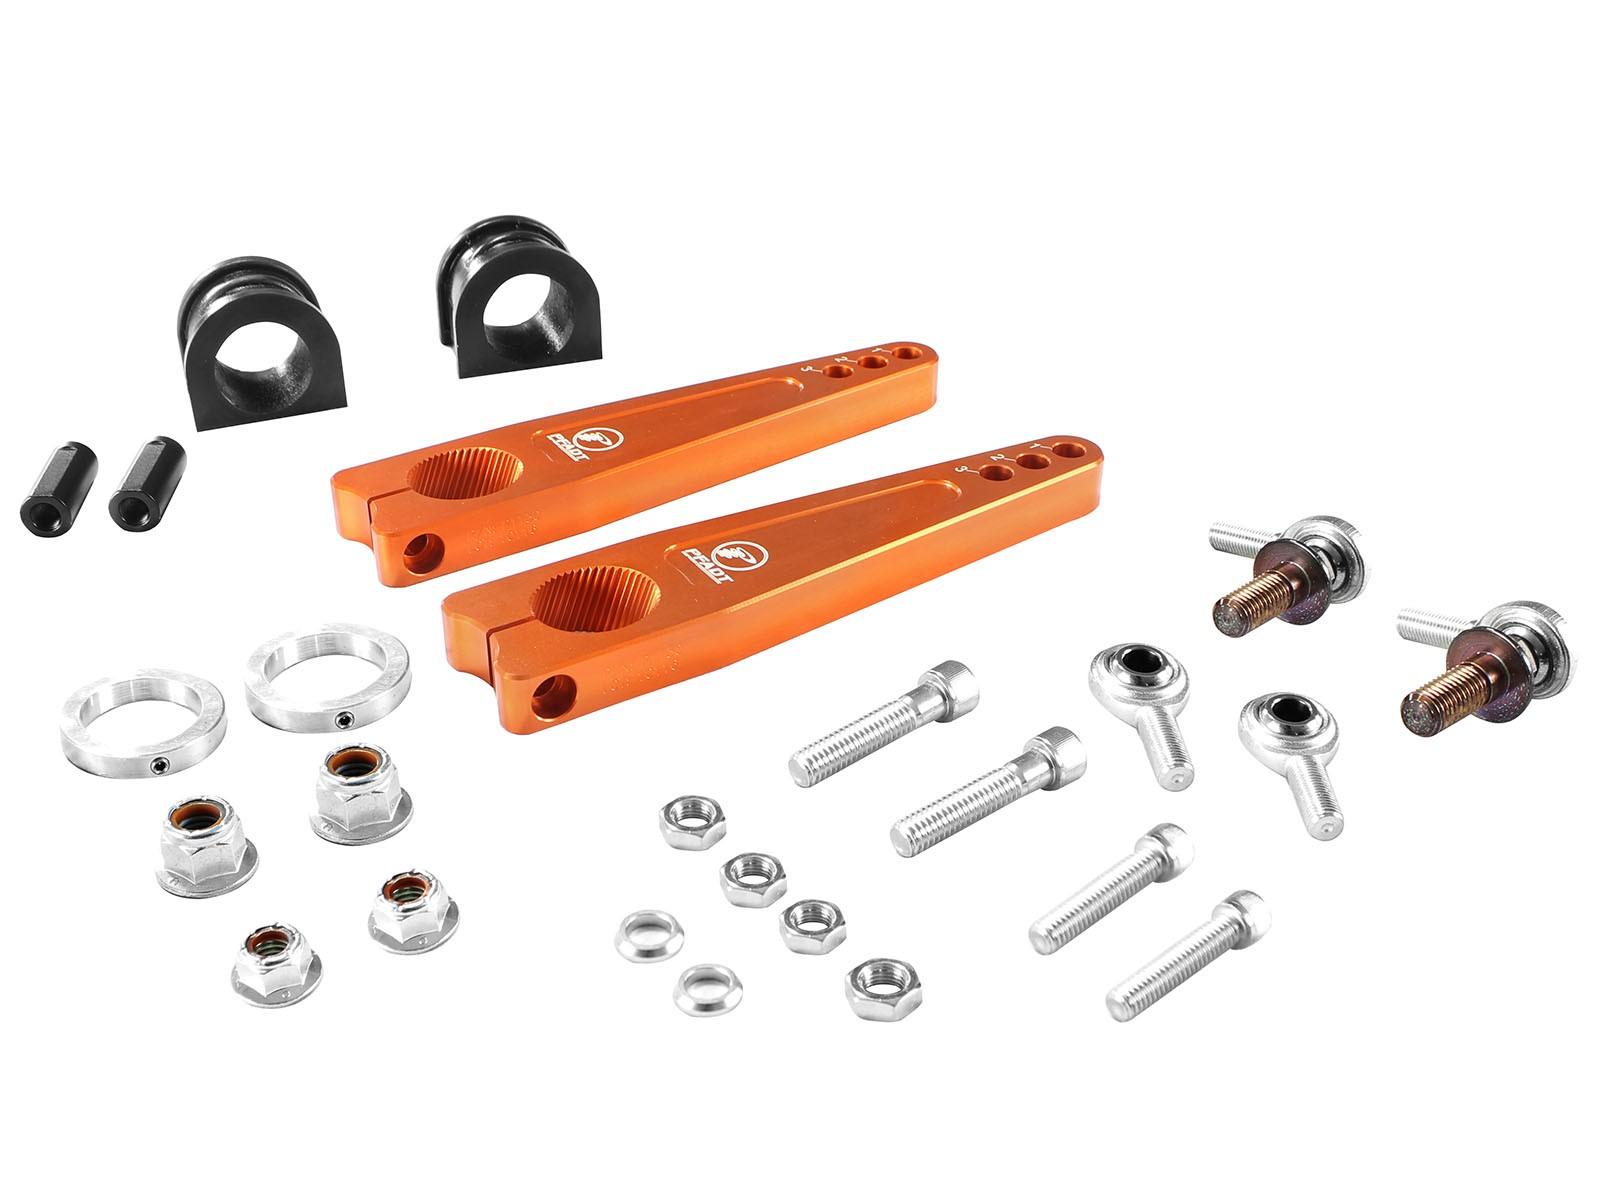 aFe POWER 441-401002-N aFe Control PFADT Series Racing Sway Bar Rear Service Kit